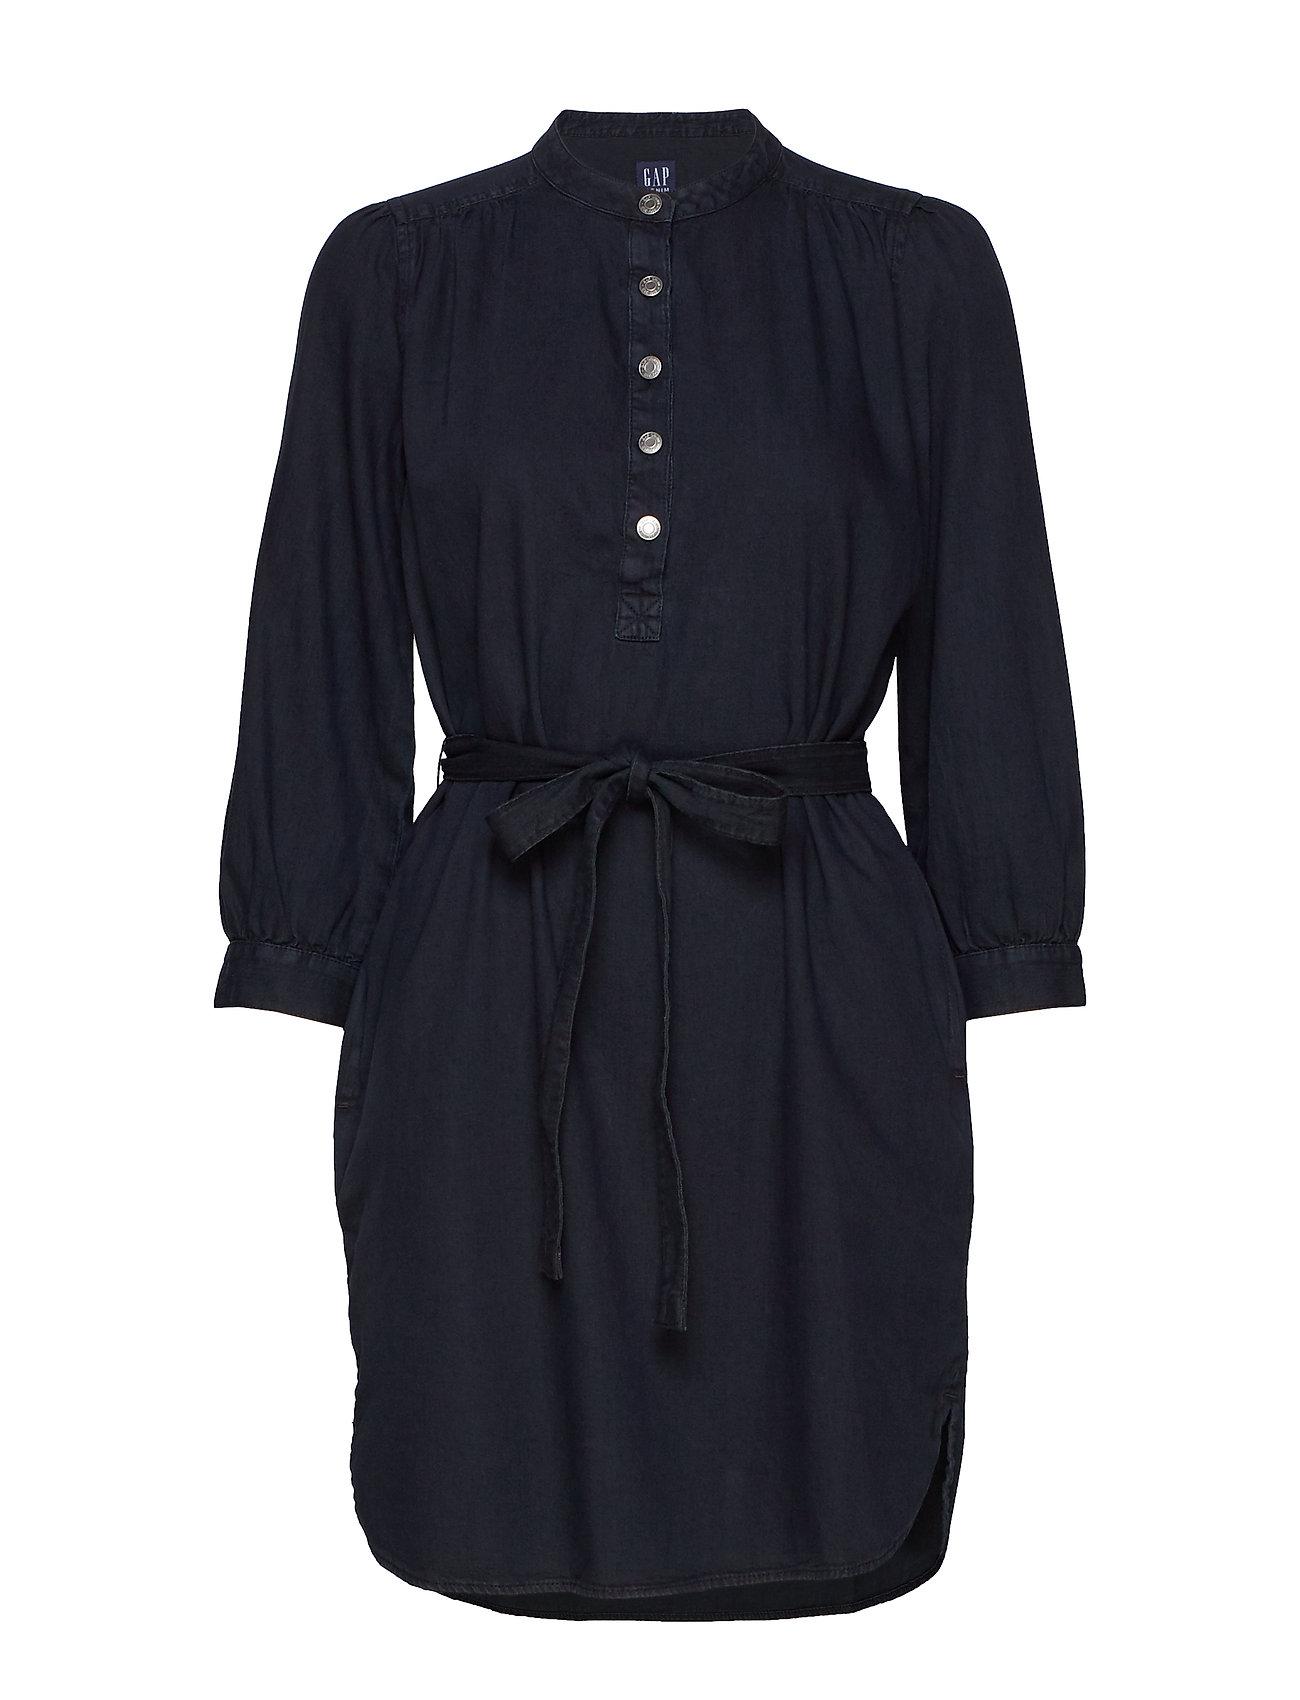 GAP Shirred Popover Denim Shirtdress - BLACK WASH